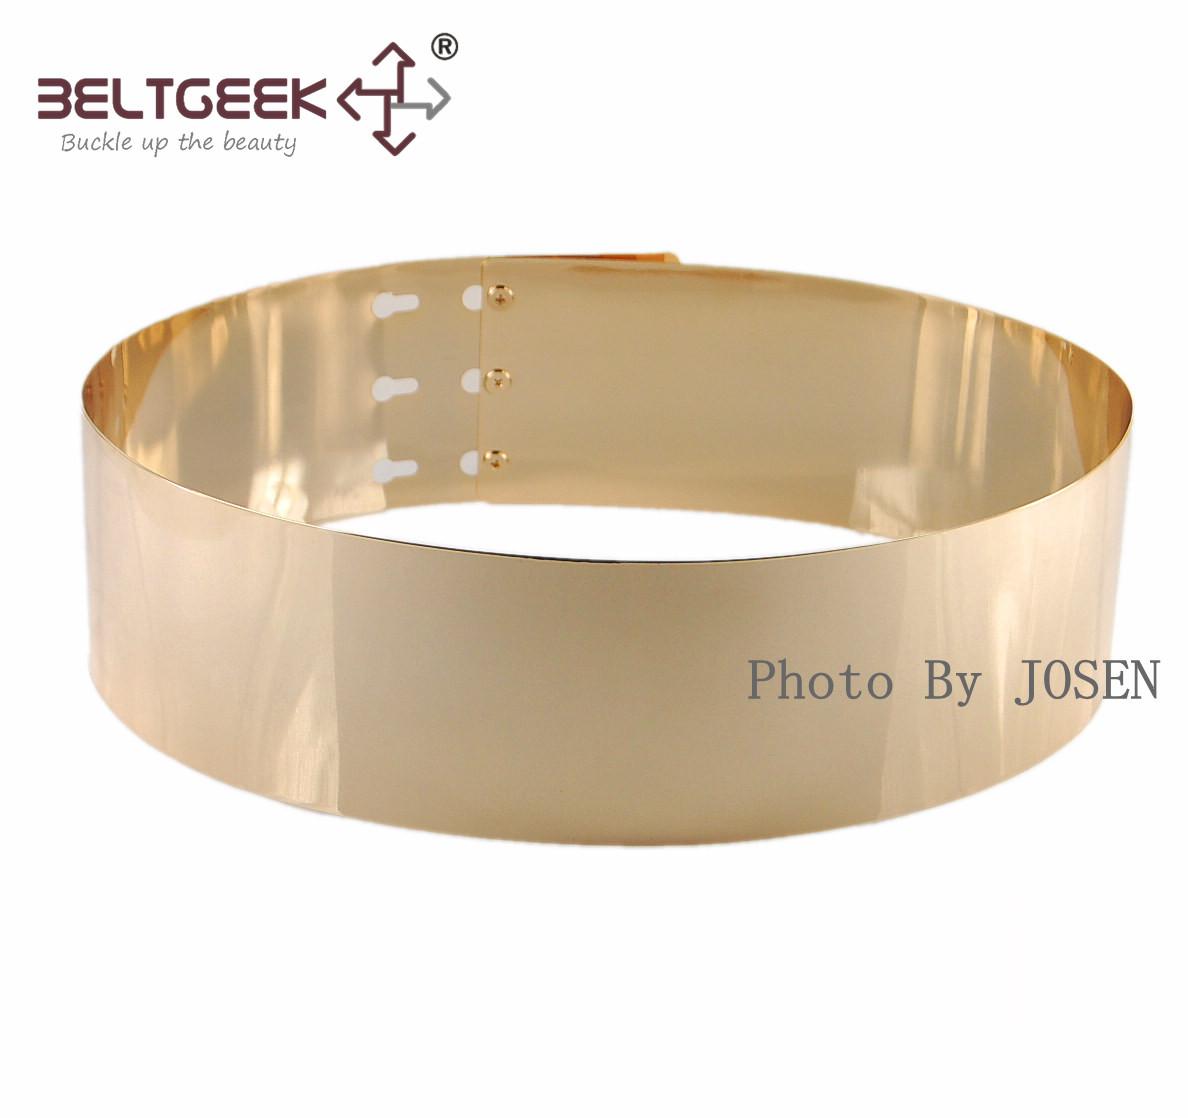 2014 New Fashion 7cm Width Metal Mirror Cummerbunds Women Wide Gold Belt 3100706 - Boutique cottages store